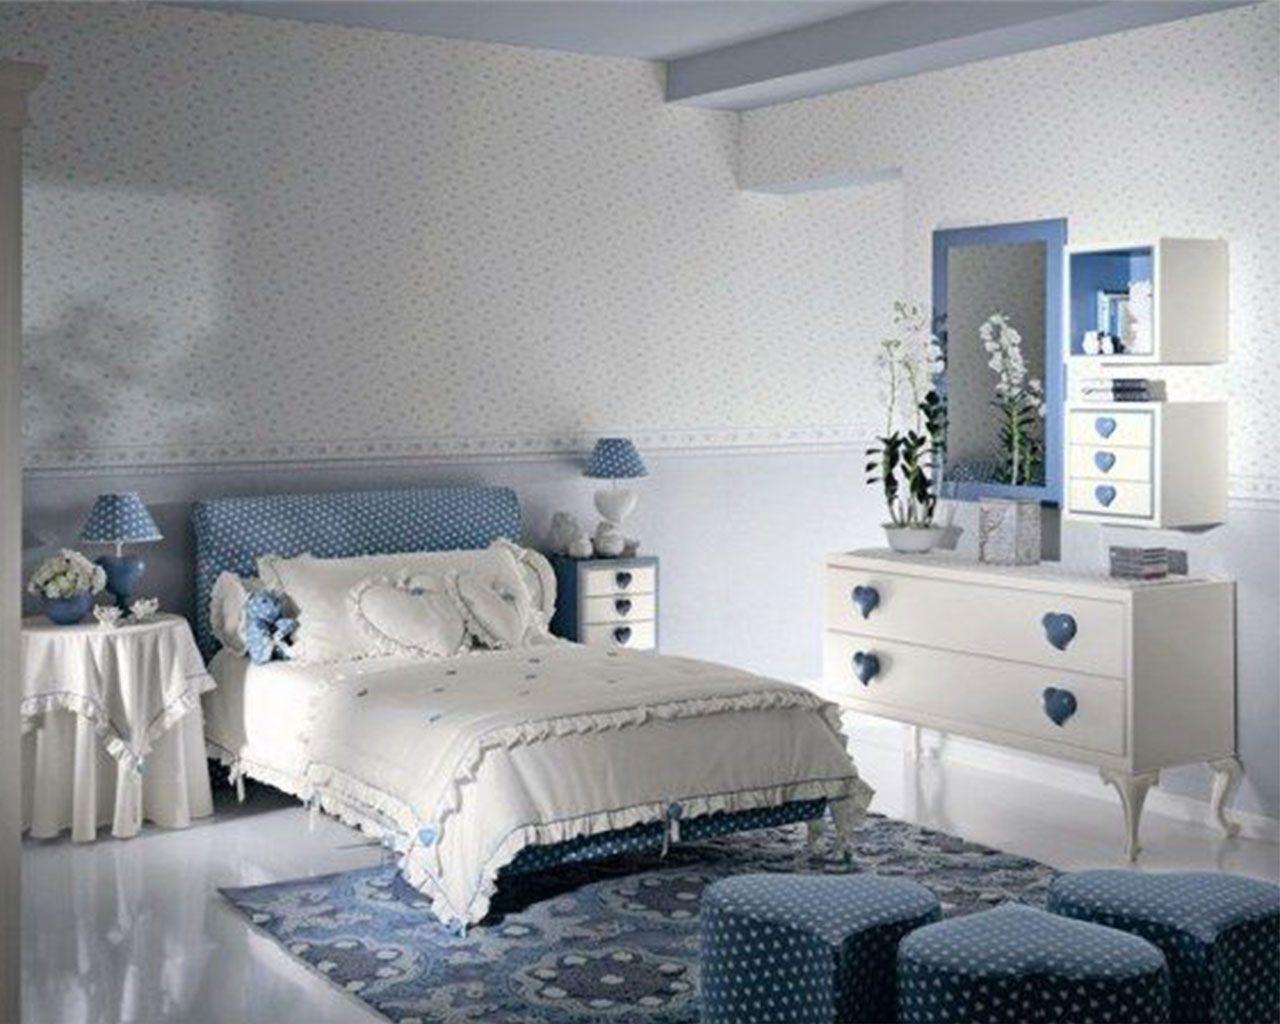 Bedroom for girls | интерьер | Pinterest | Boy girl bedroom, Girls ...